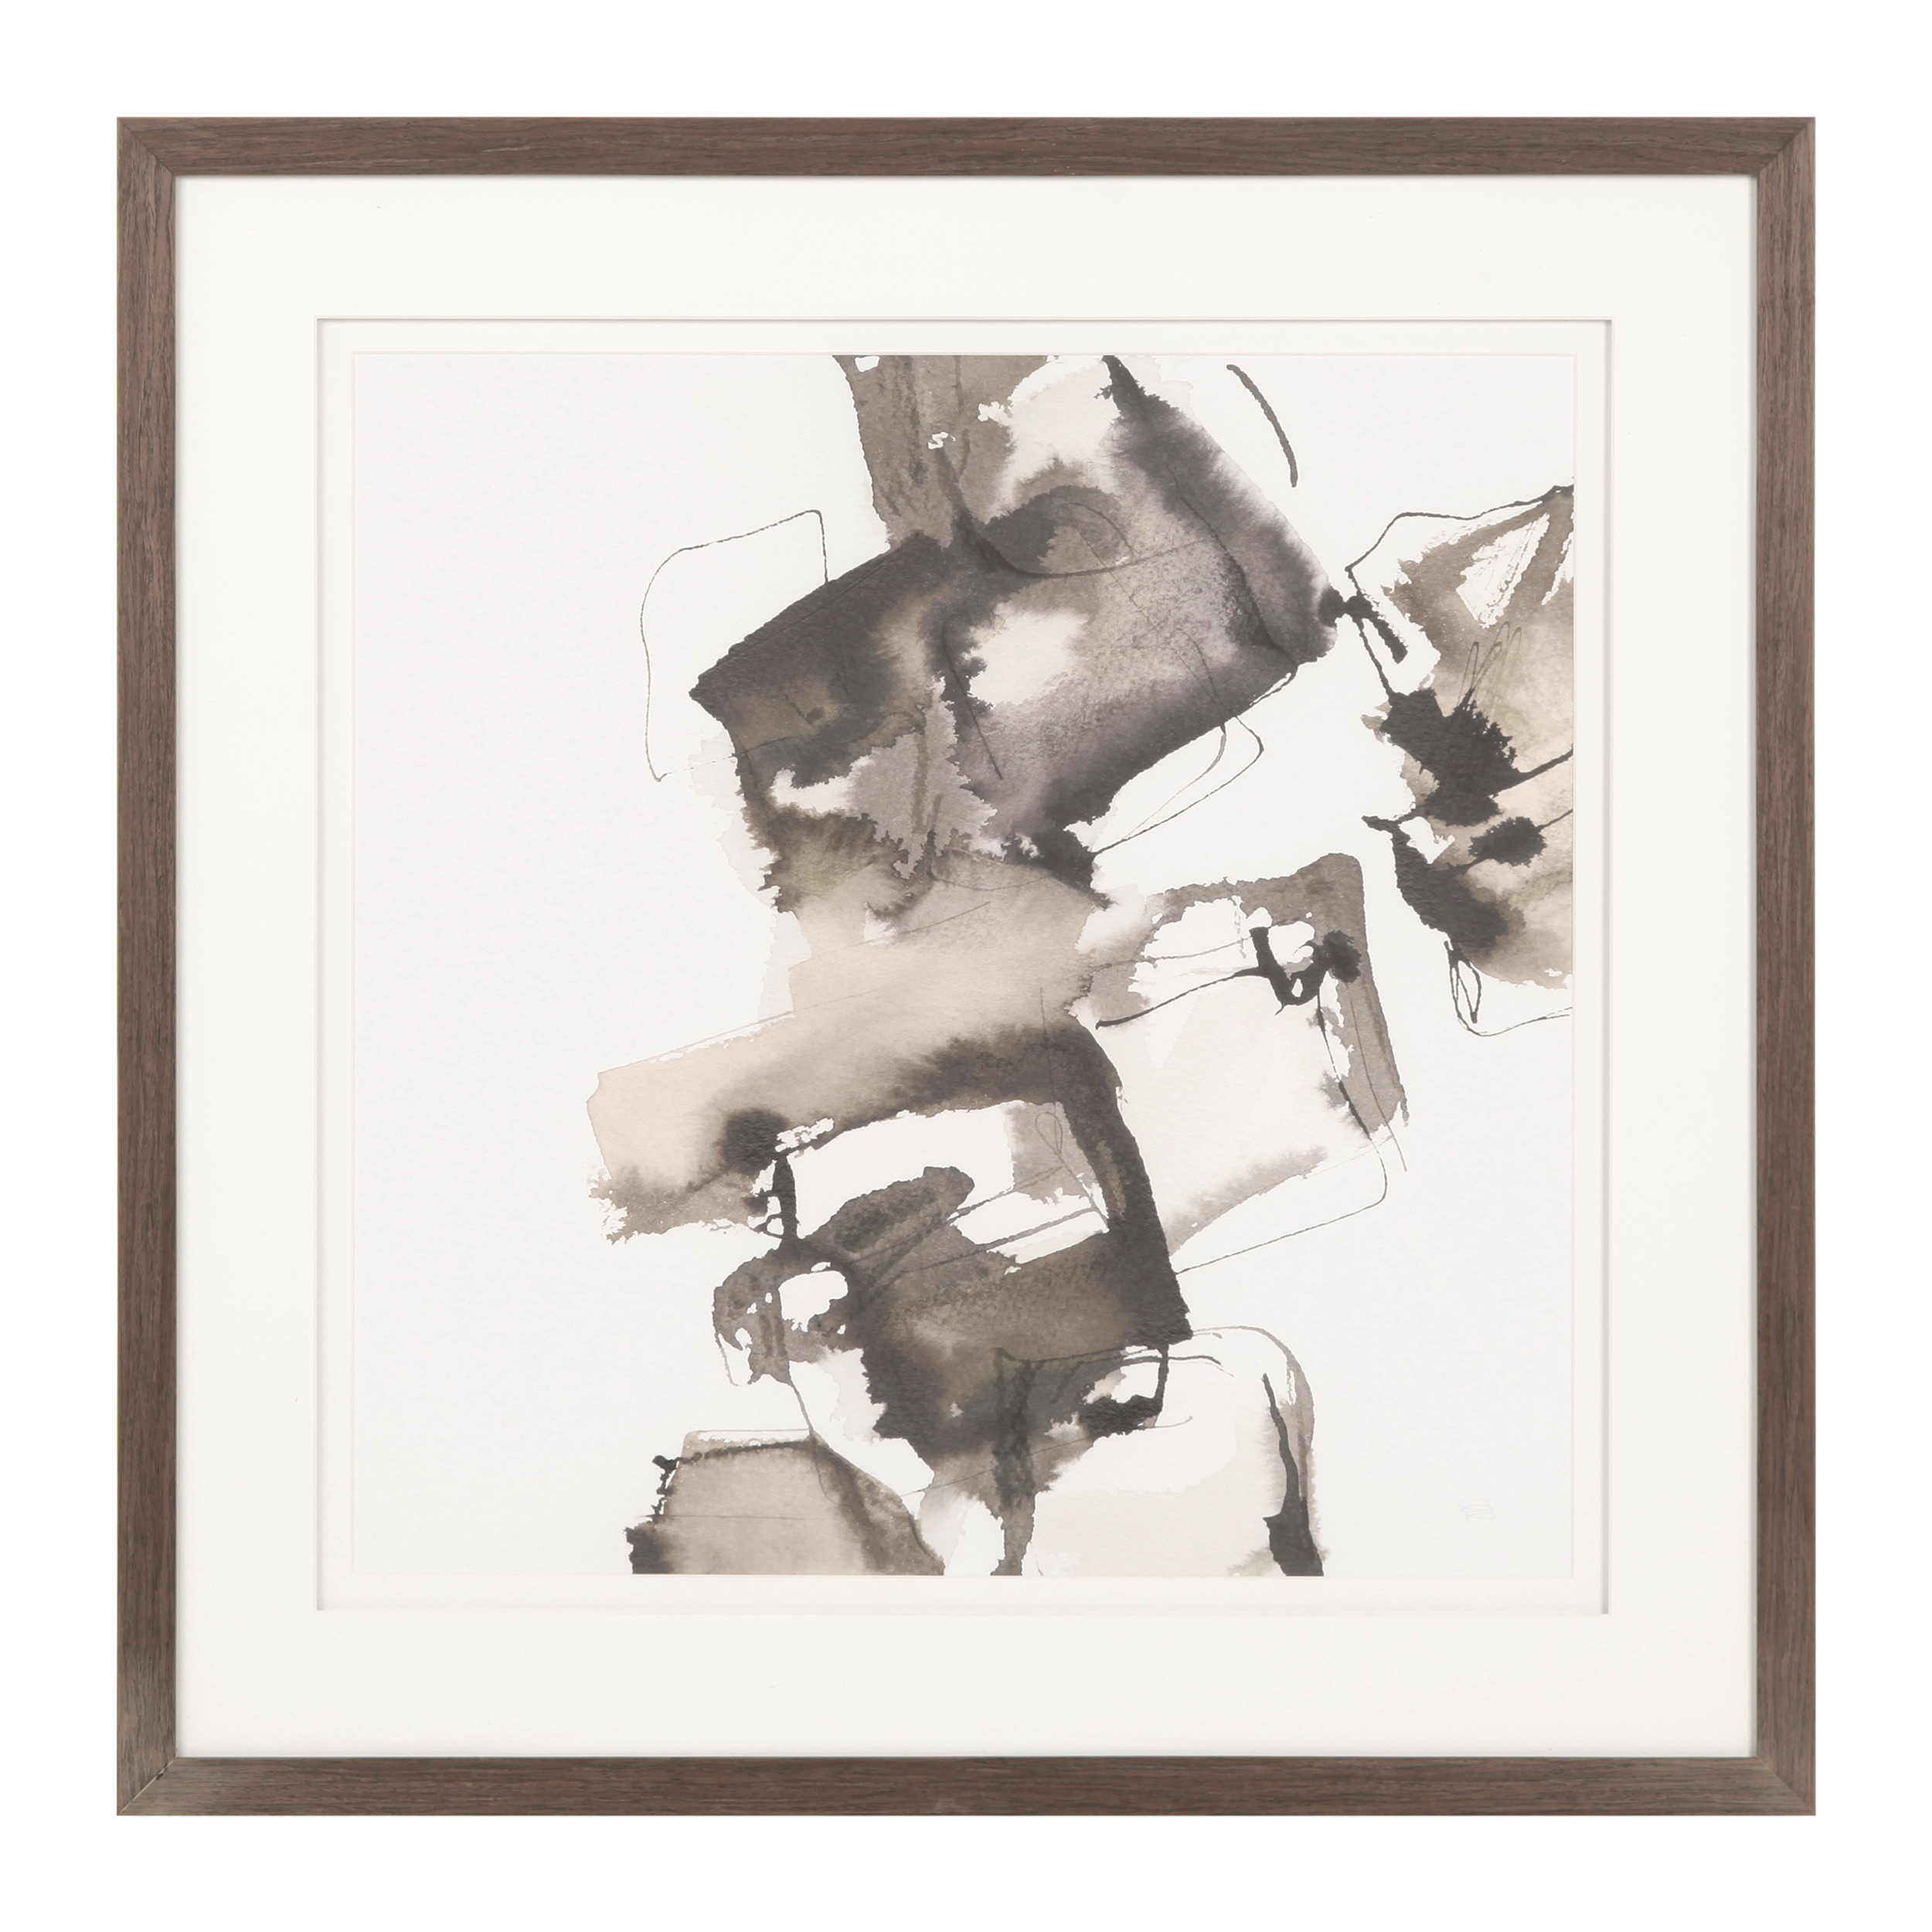 Постер Abstraction 1Картины<br><br><br>stock: 5<br>Ширина: 81,4<br>Цвет: Разноцветный<br>Длина: 81,4